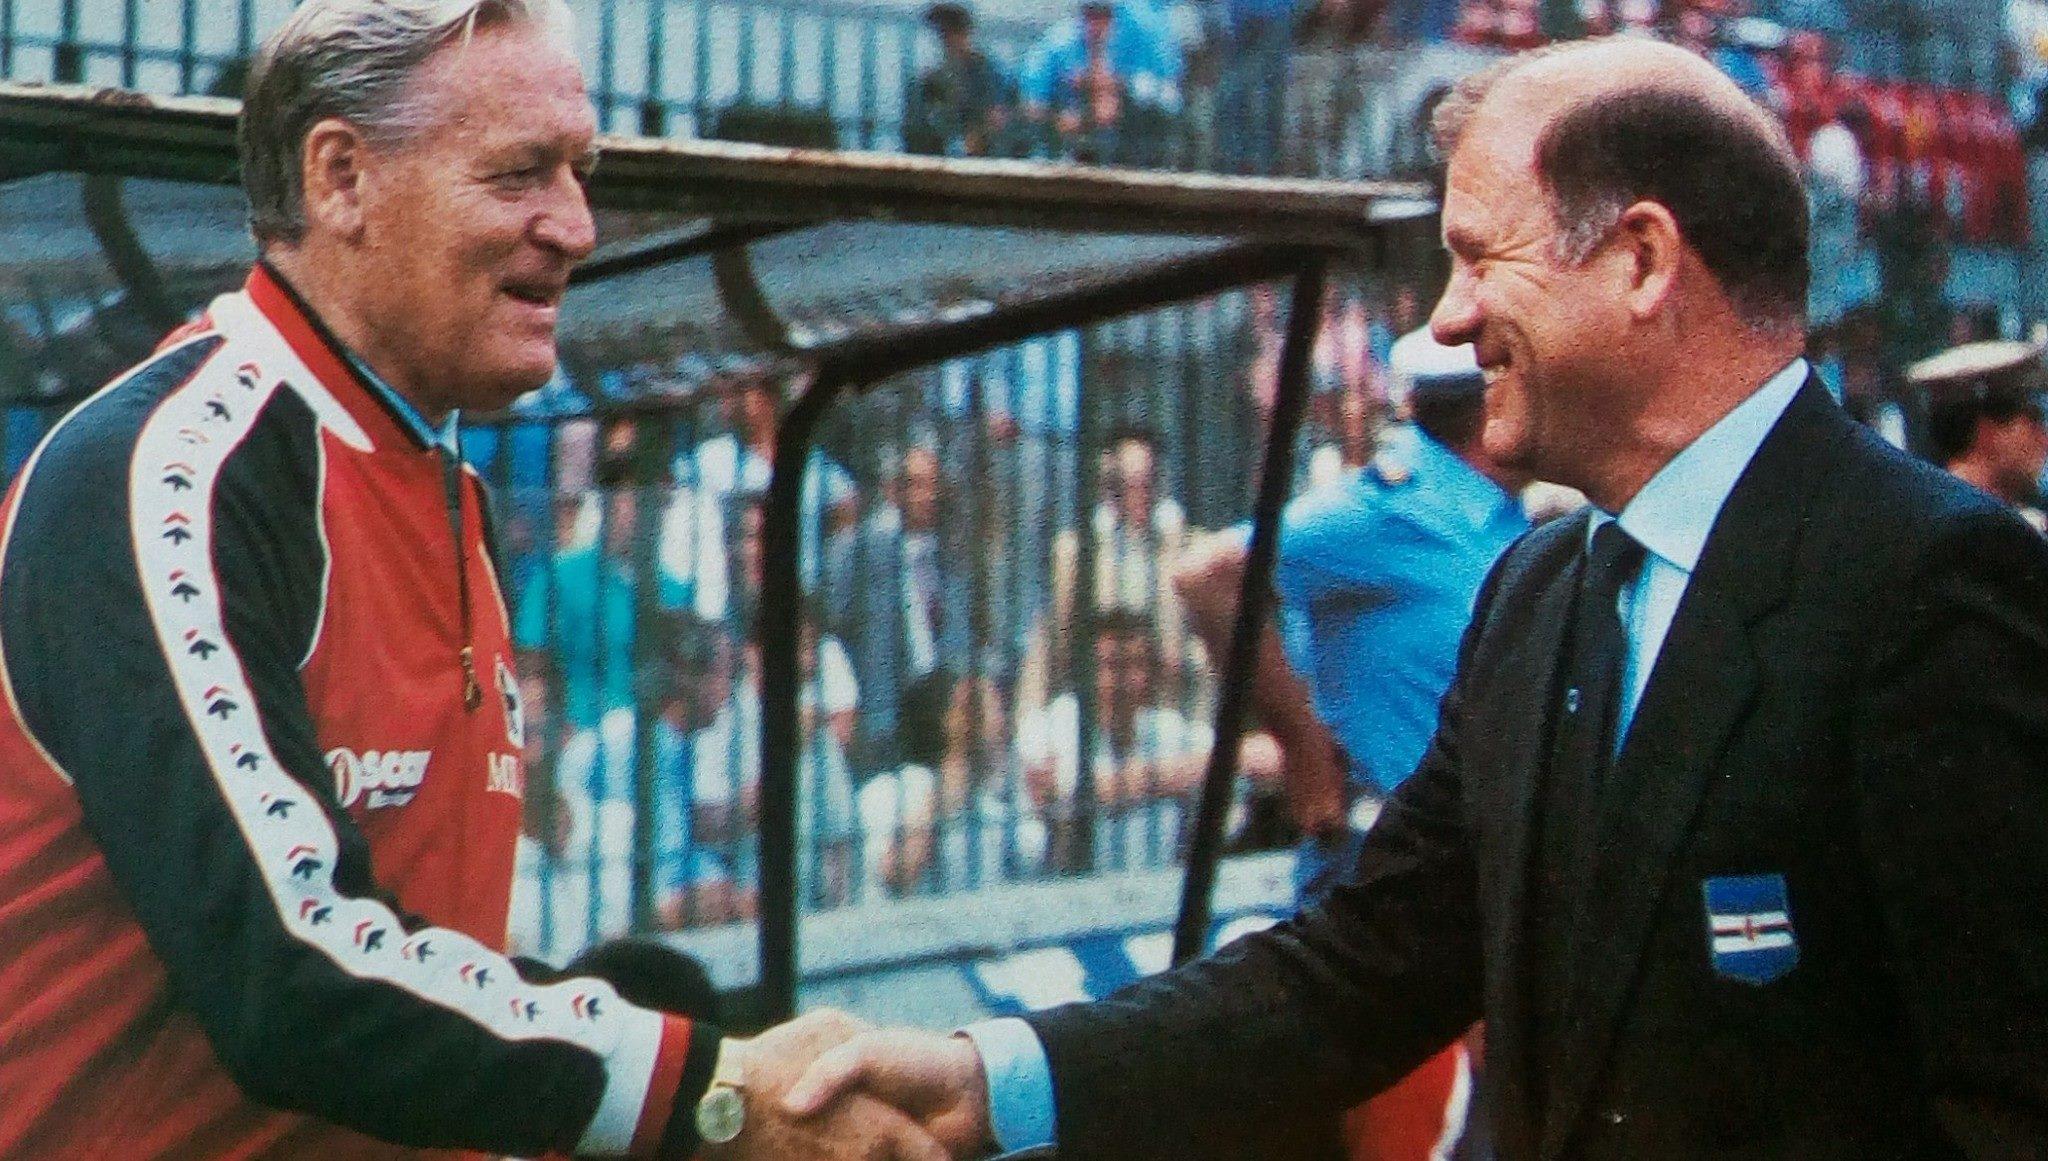 File Coppa Italia 1984 85 Milan vs Sampdoria Nils Liedholm ed